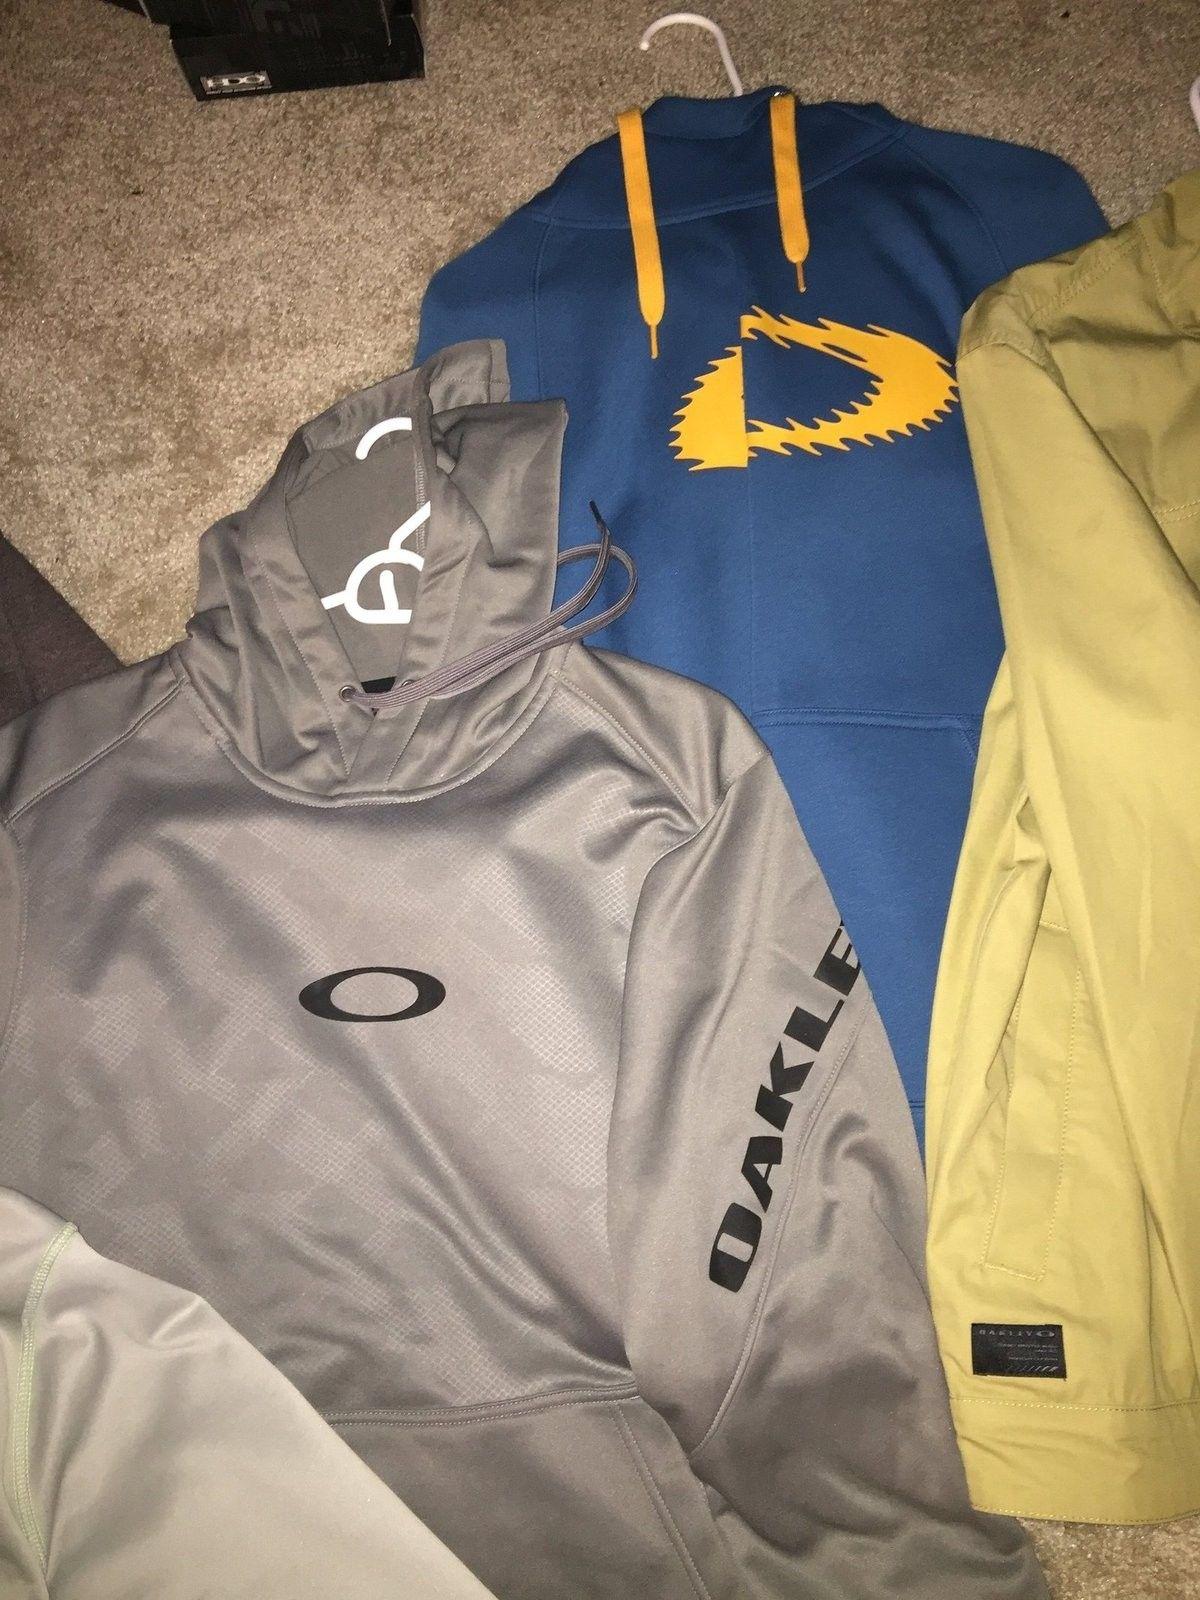 4 Oakley hoodies 1 Oakley jacket new without tags - image.jpeg